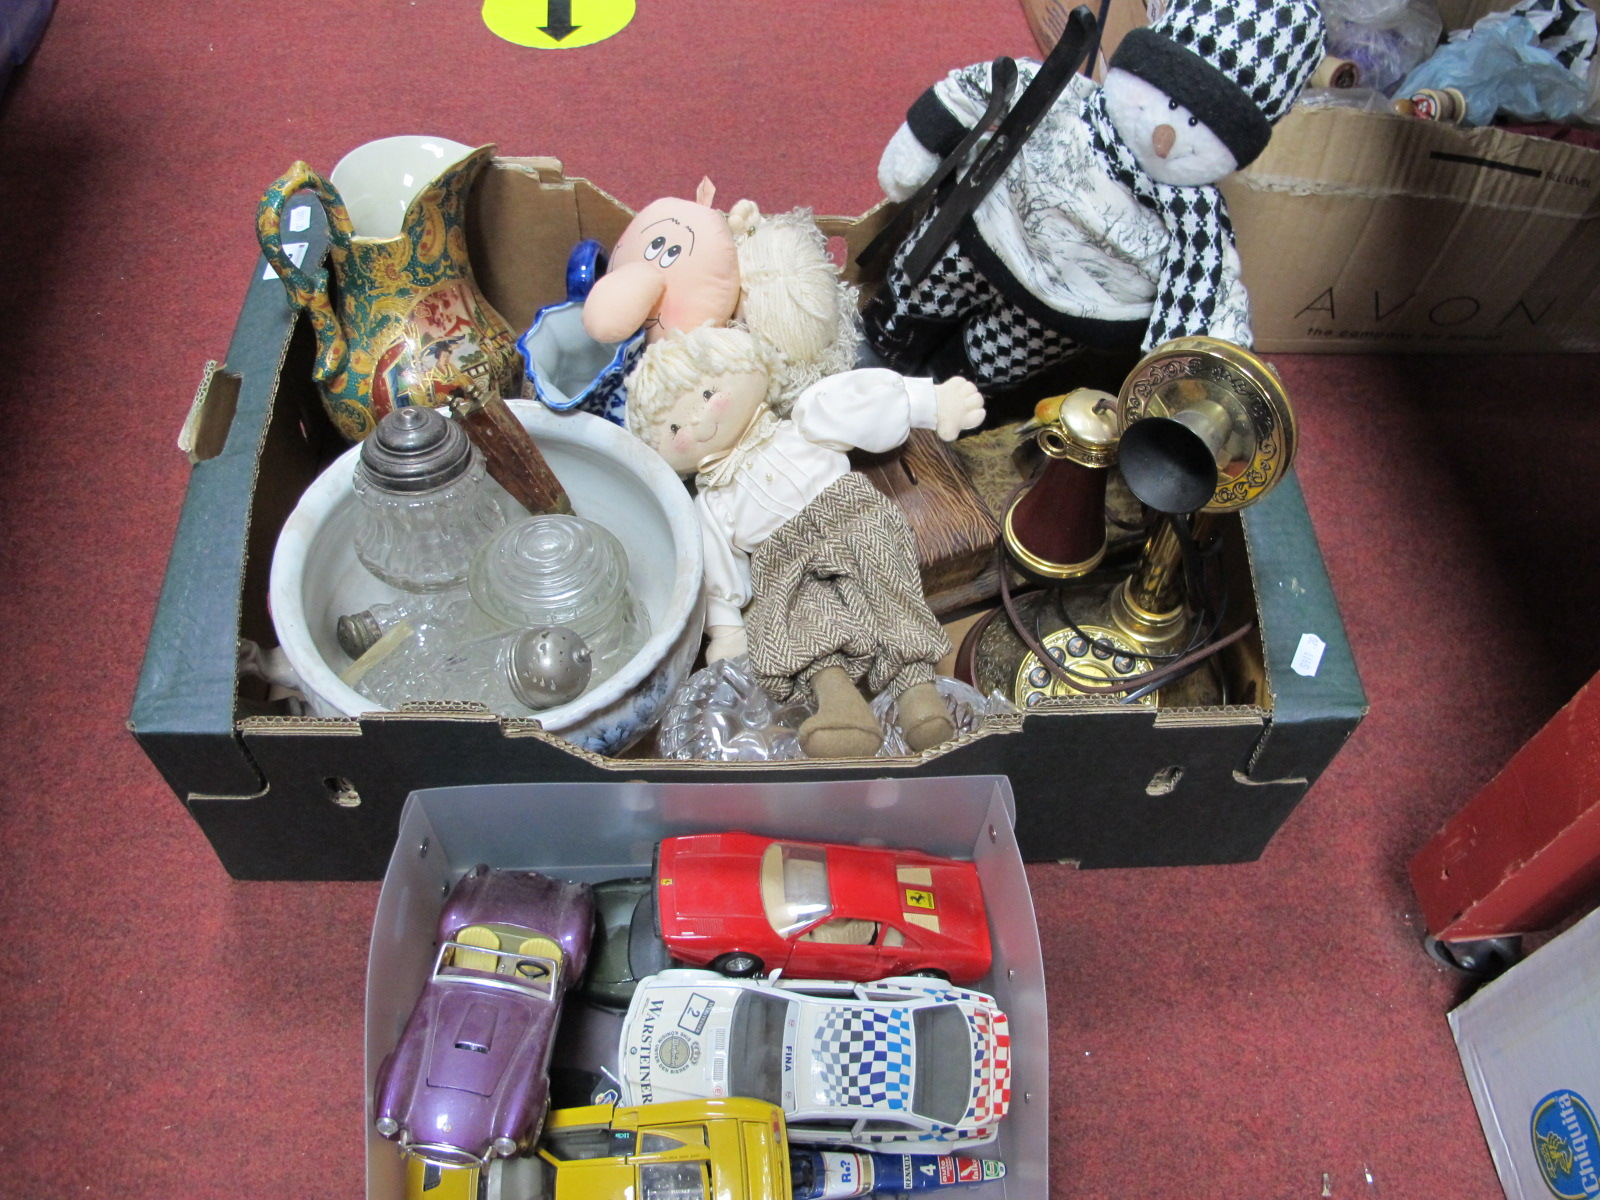 Lot 36 - Modern Reproduction Candlestick Telephone, chamberpot, glass, pottery, soft toys, novelty